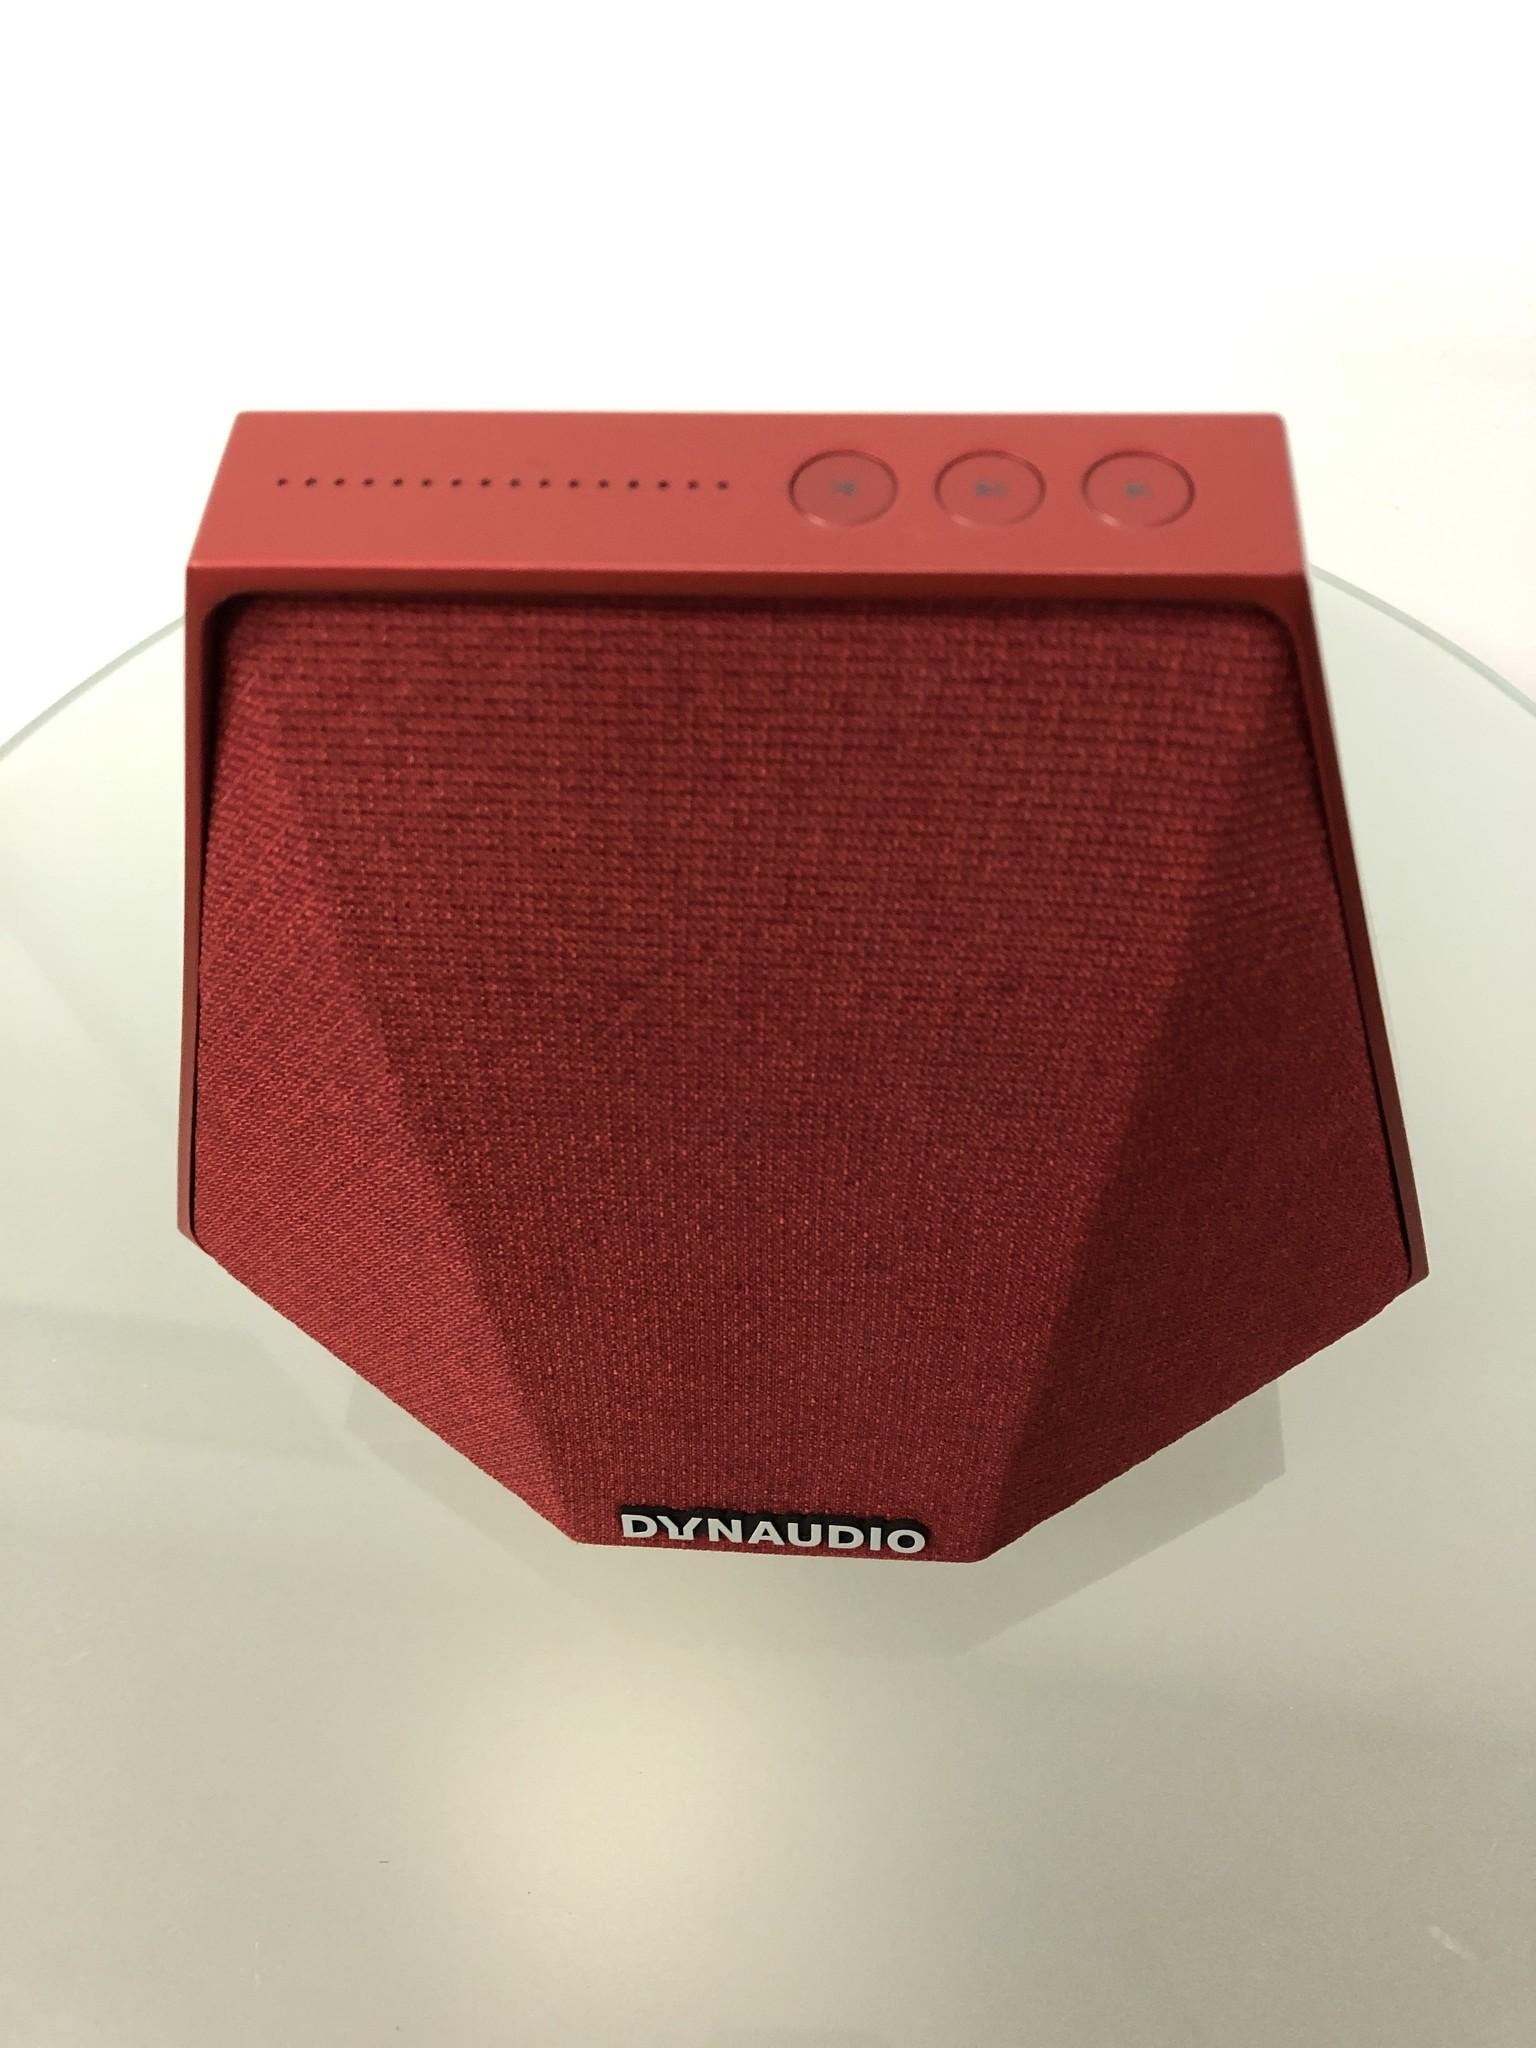 Dynaudio Dynaudio Music 1 Red - VERKAUFT